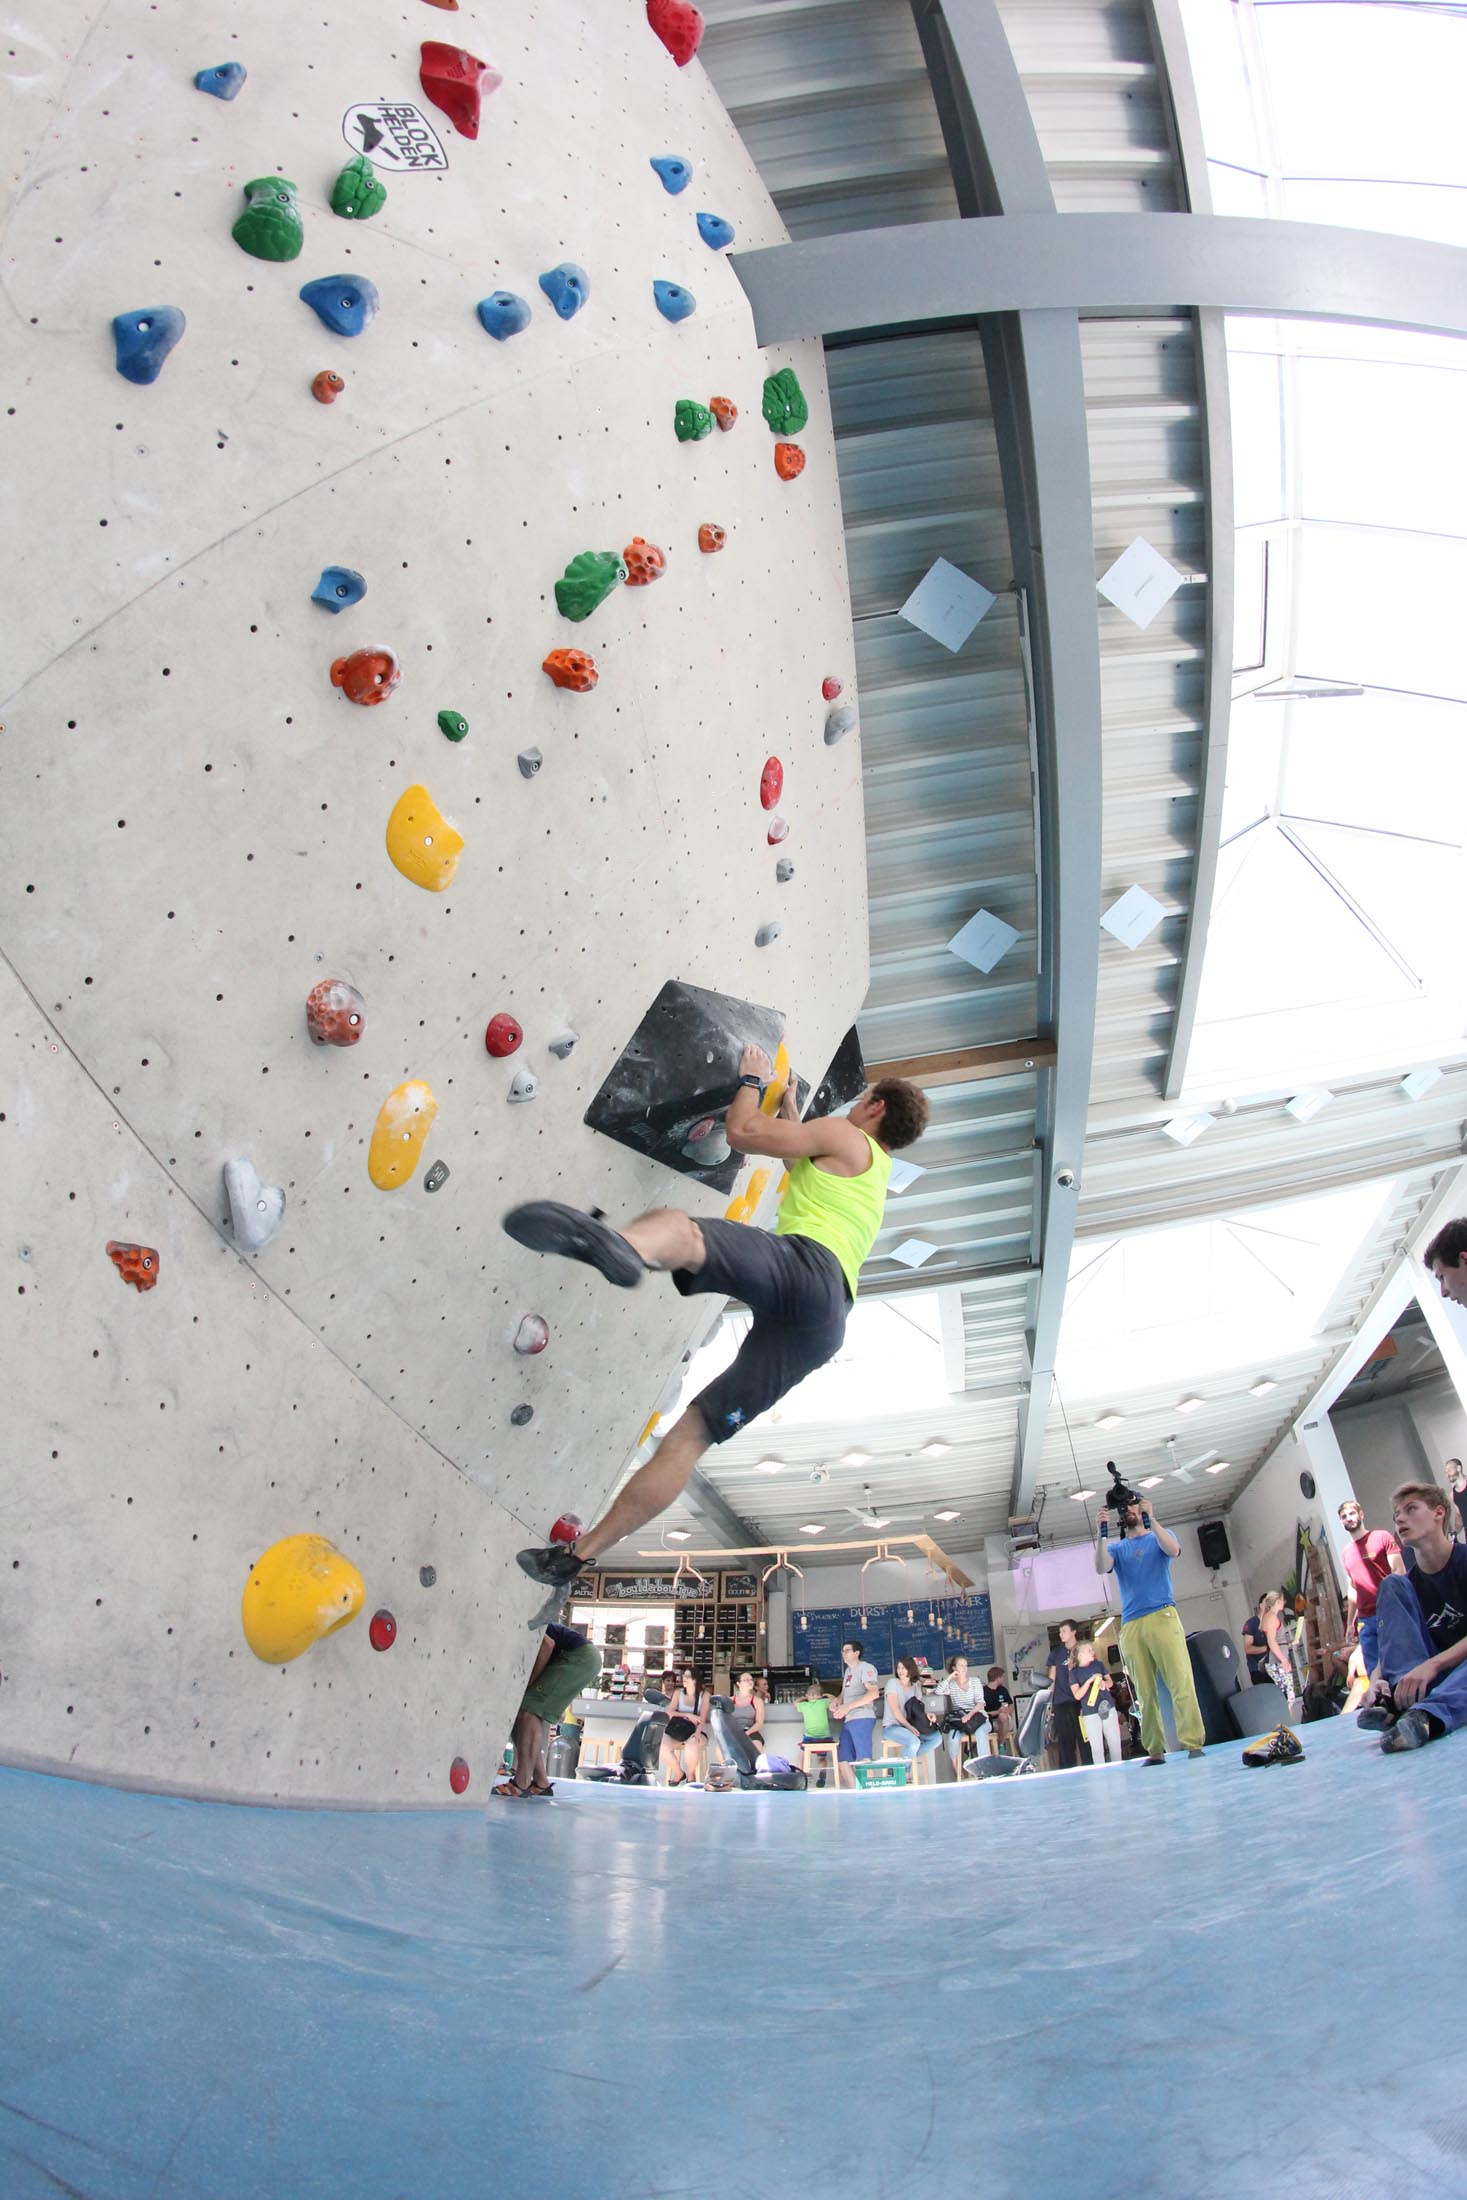 Quali, internationaler bouldercup Frankenjura 2016, BLOCKHELDEN Erlangen, Mammut, Bergfreunde.de, Boulderwettkampf07092016129